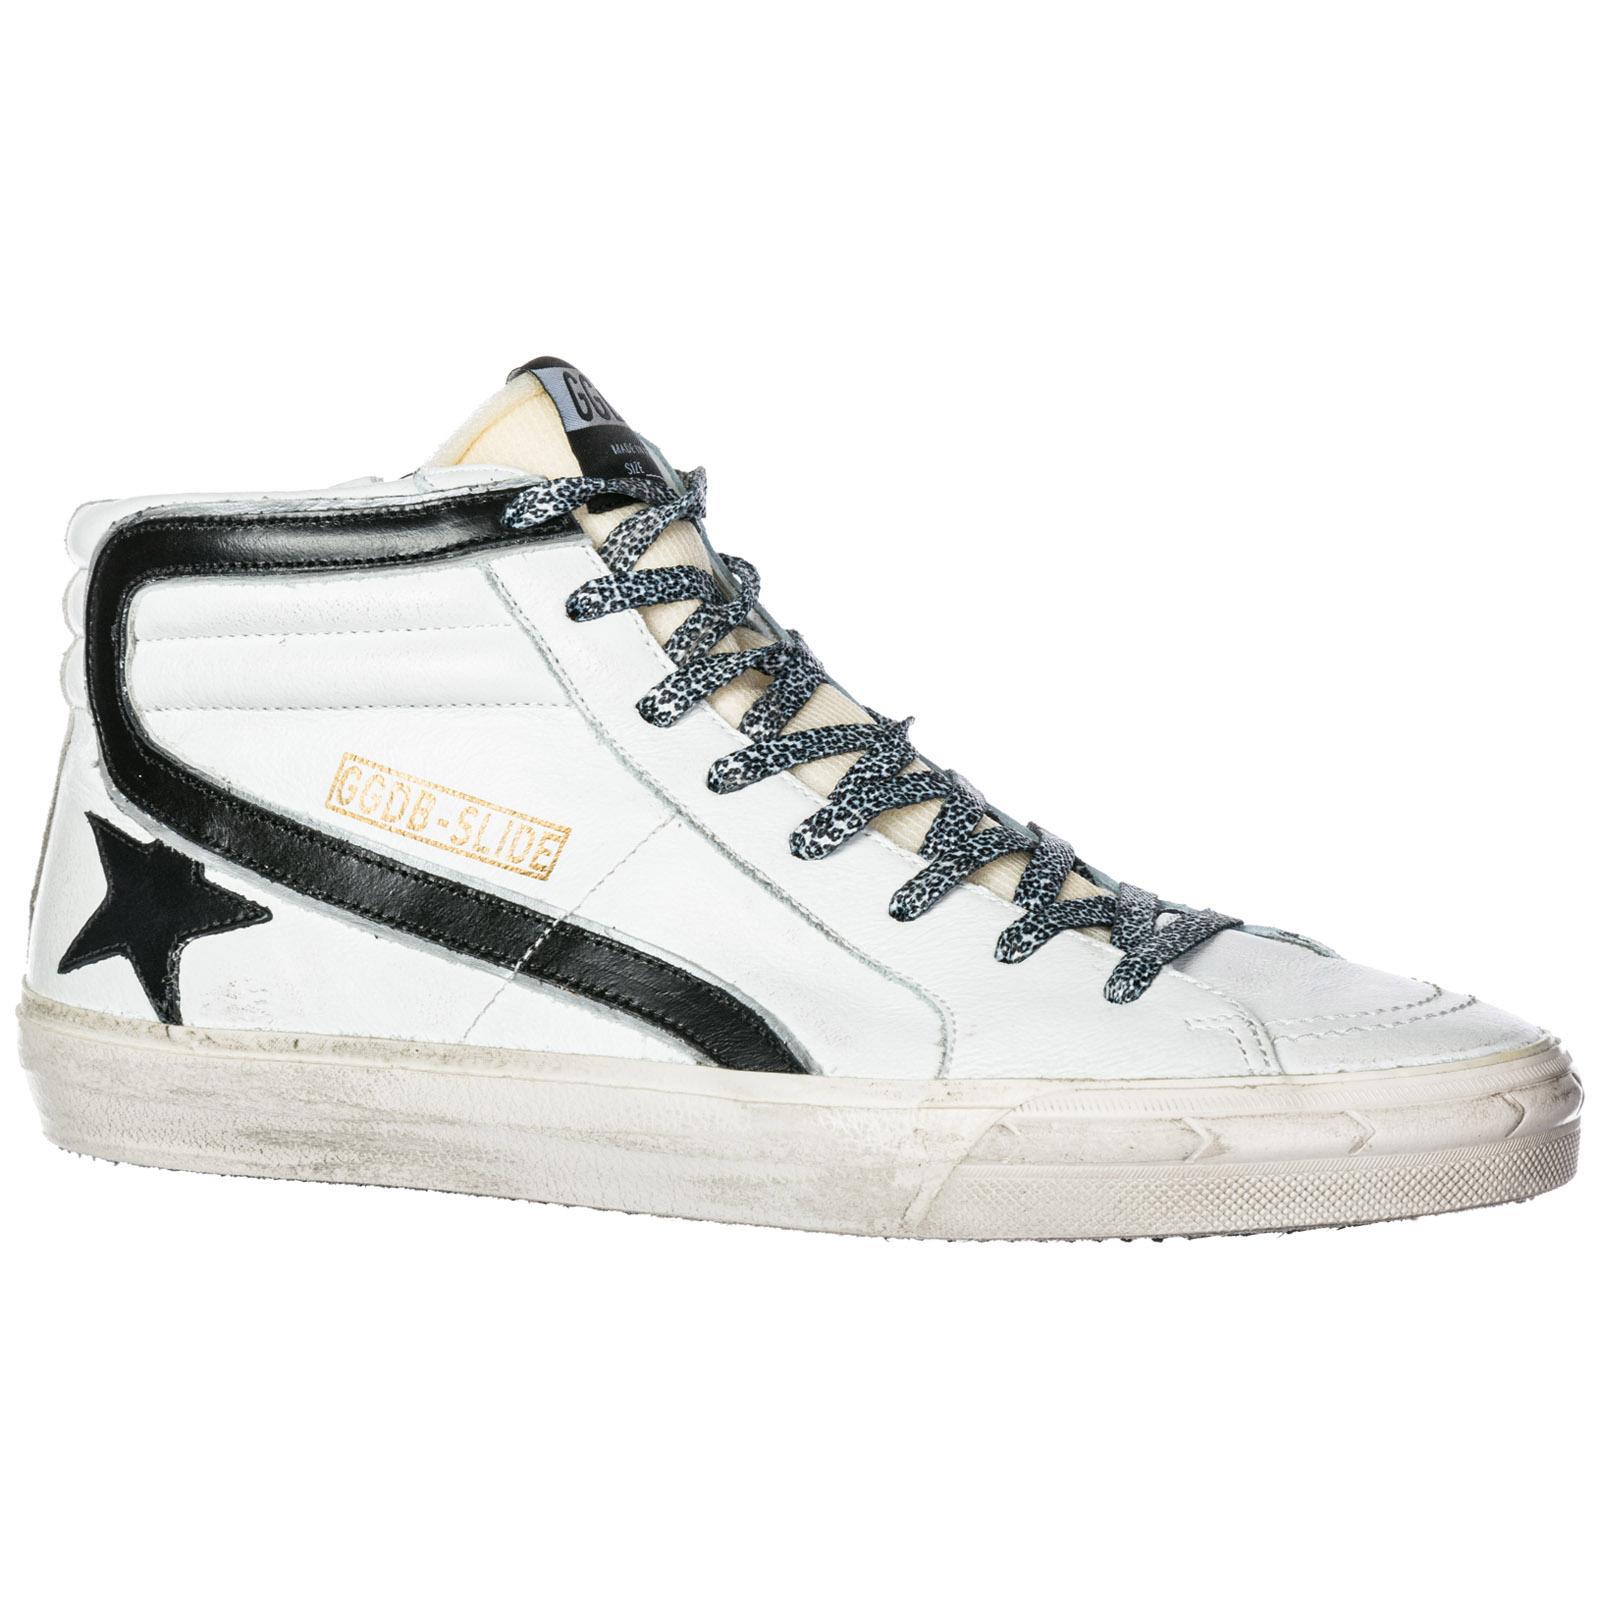 2e85e1c57f93 Высокие кроссовки Golden Goose Slide G33MS595.U5 white leather ...